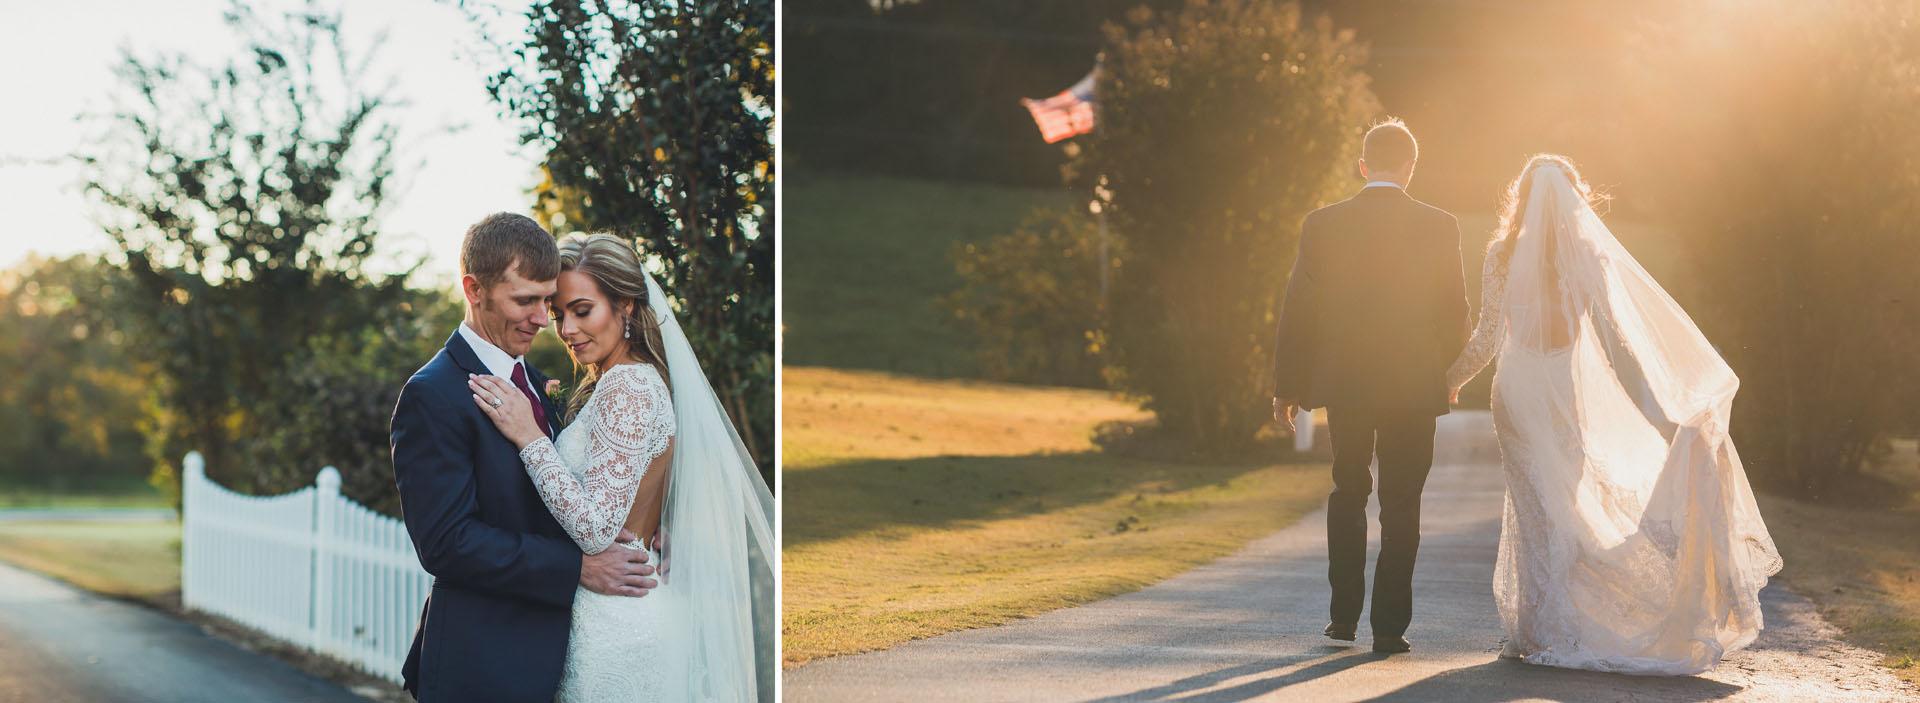 Fall South Carolina Wedding